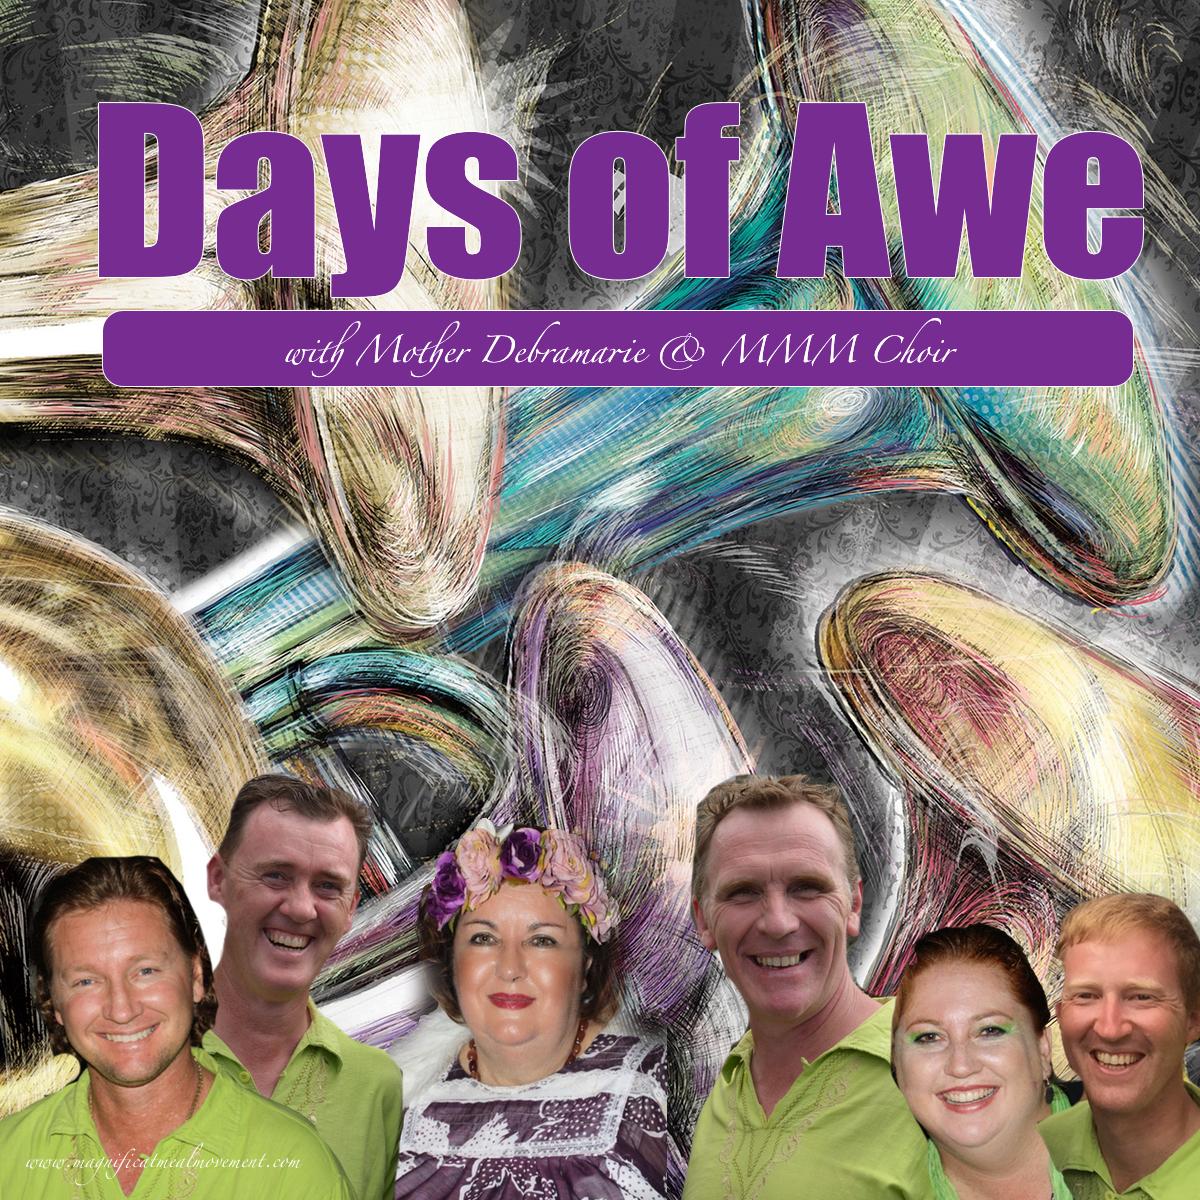 Days of Awe SKU 10436